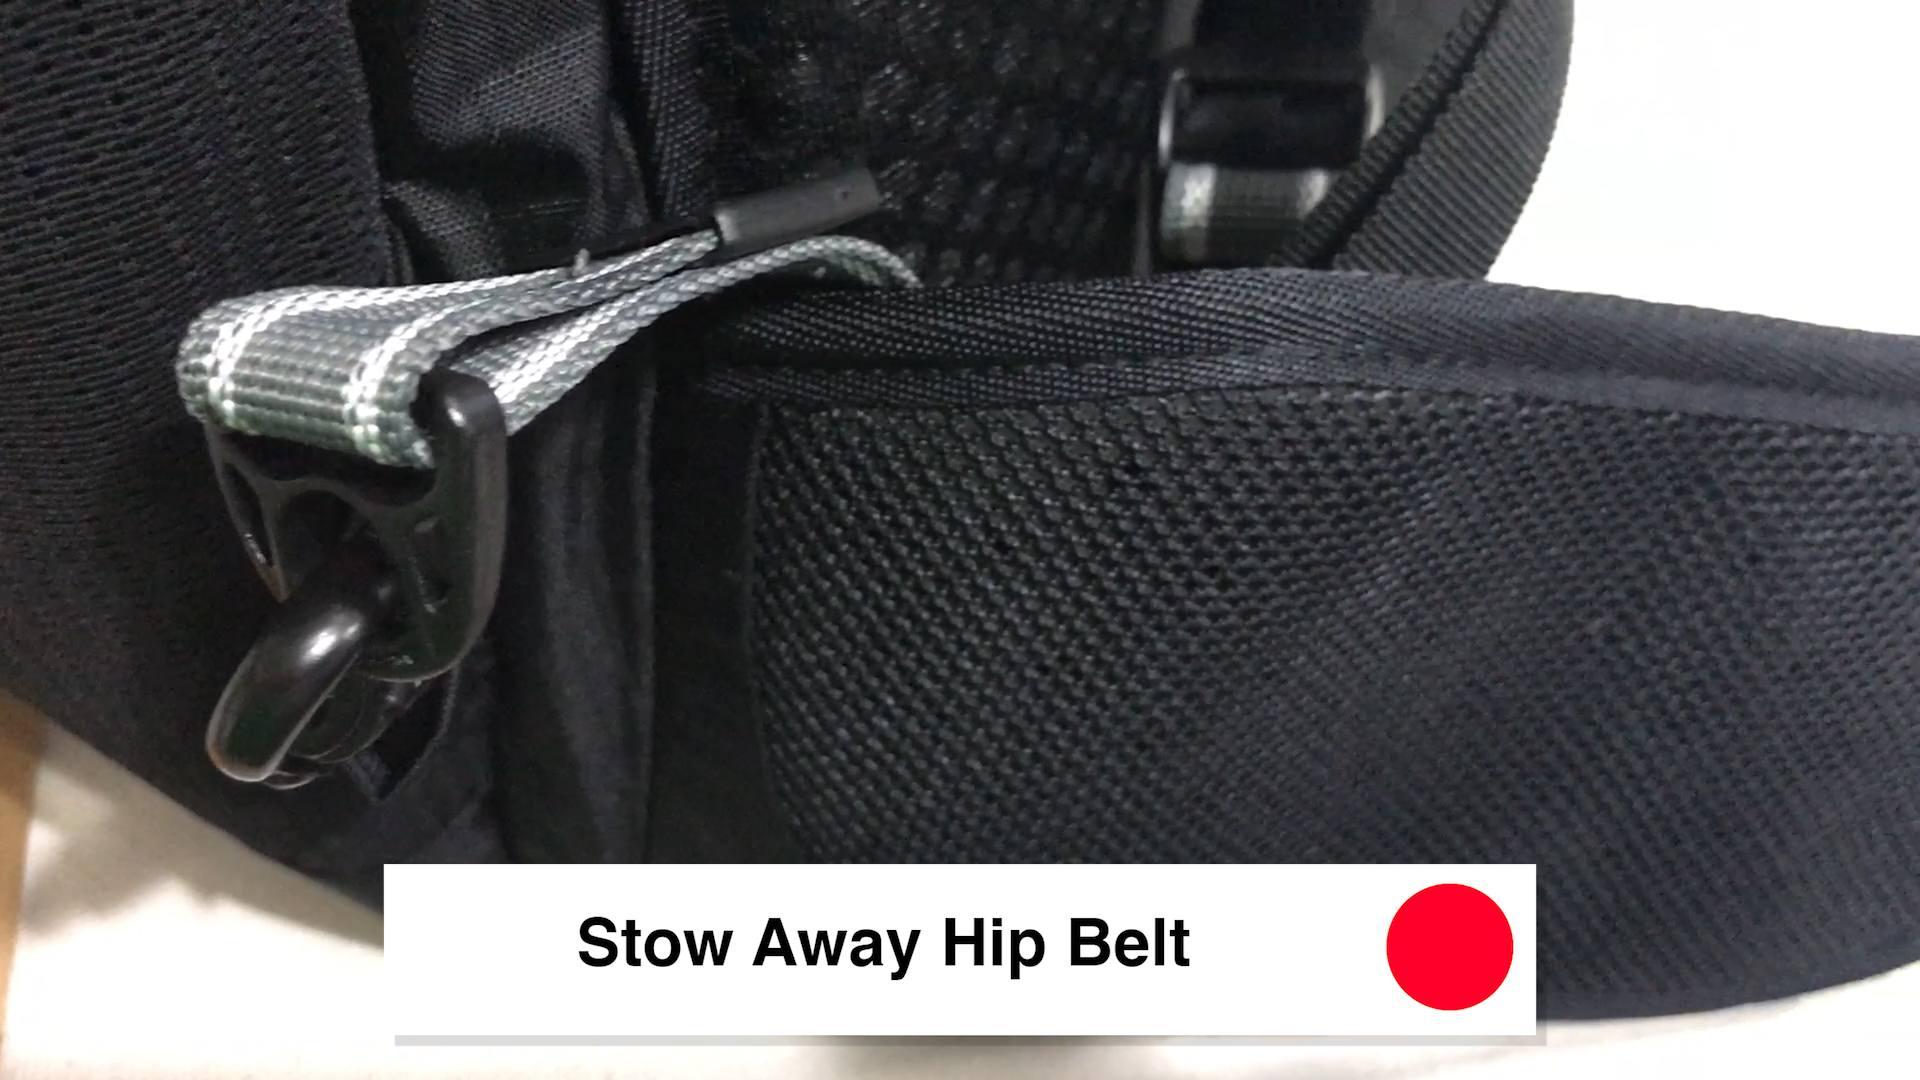 Stow Away Hip Belt - Pacsafe Venturesafe X30 Travel Pack - Black Anti Theft Backpack